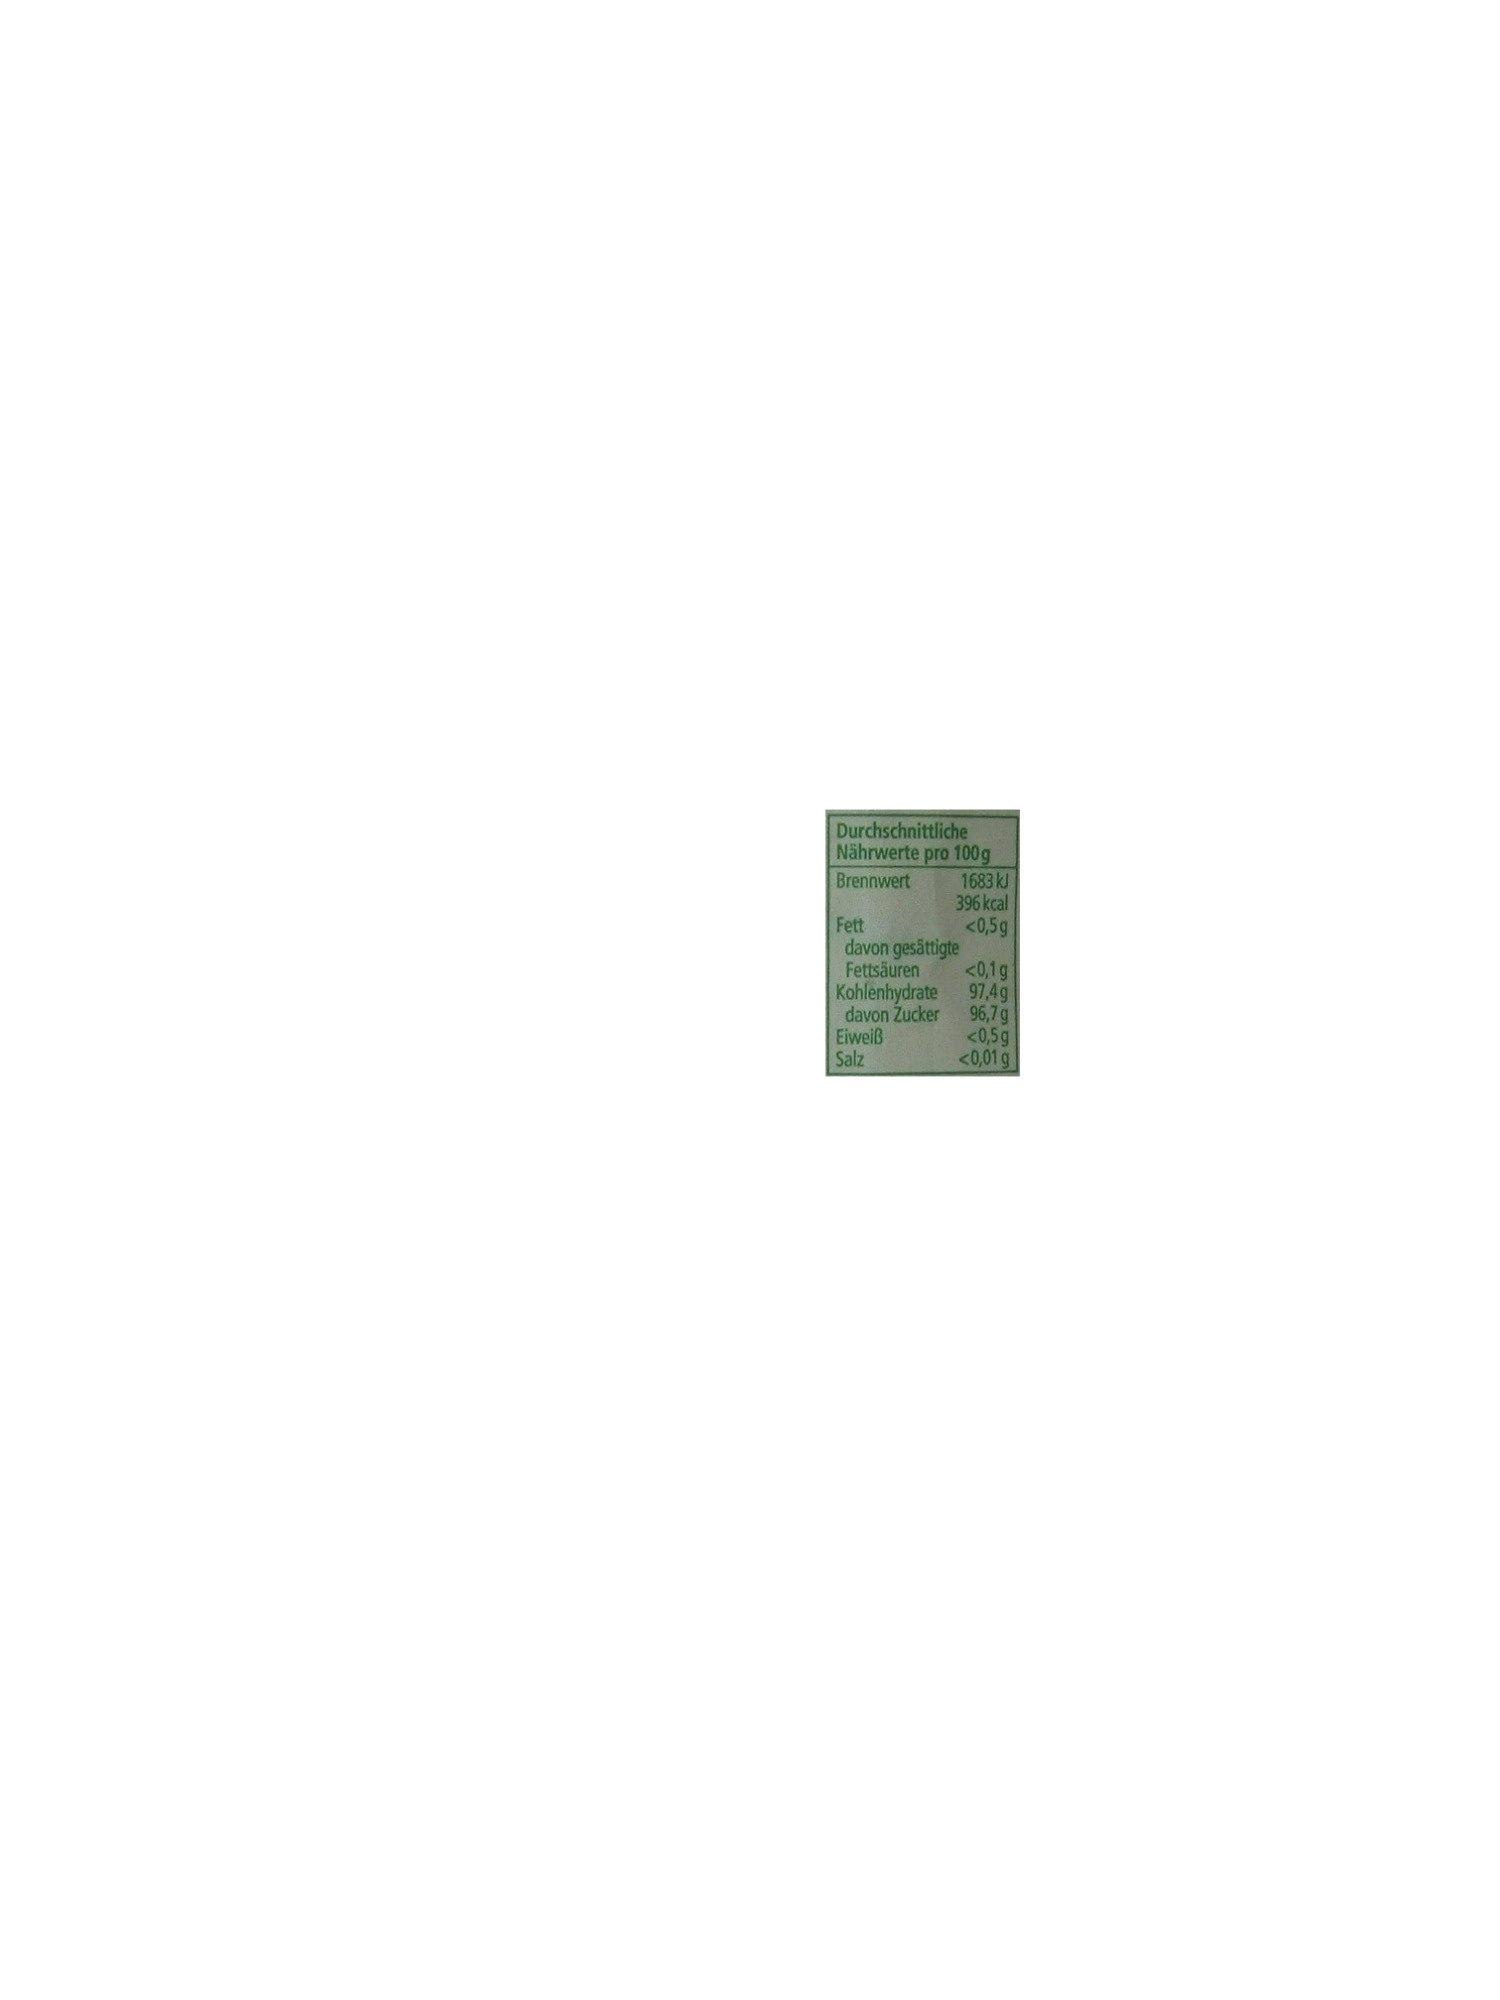 REWE Bio Roh-Rorzucker - Inhaltsstoffe - de